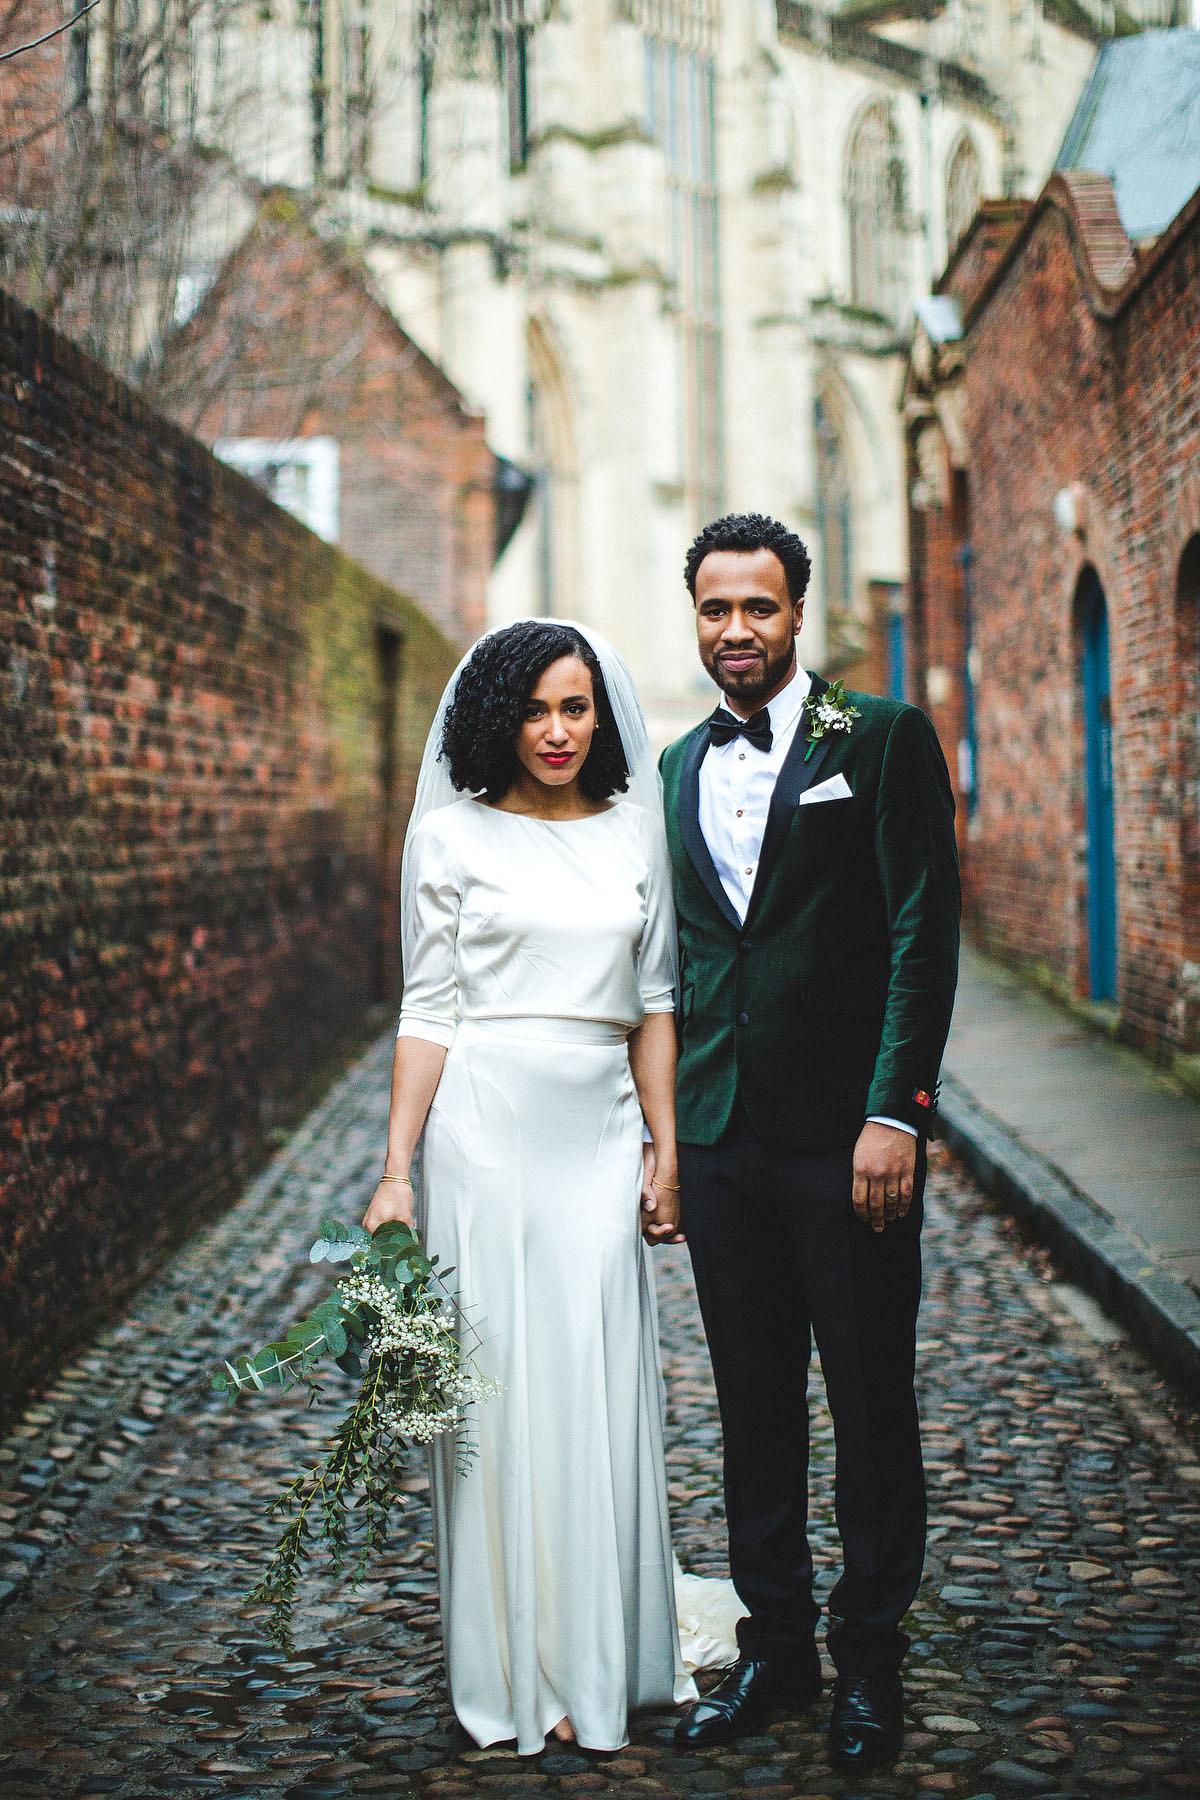 Vintage Clothing Wedding Dresses 81 Luxury Are Black Brides under